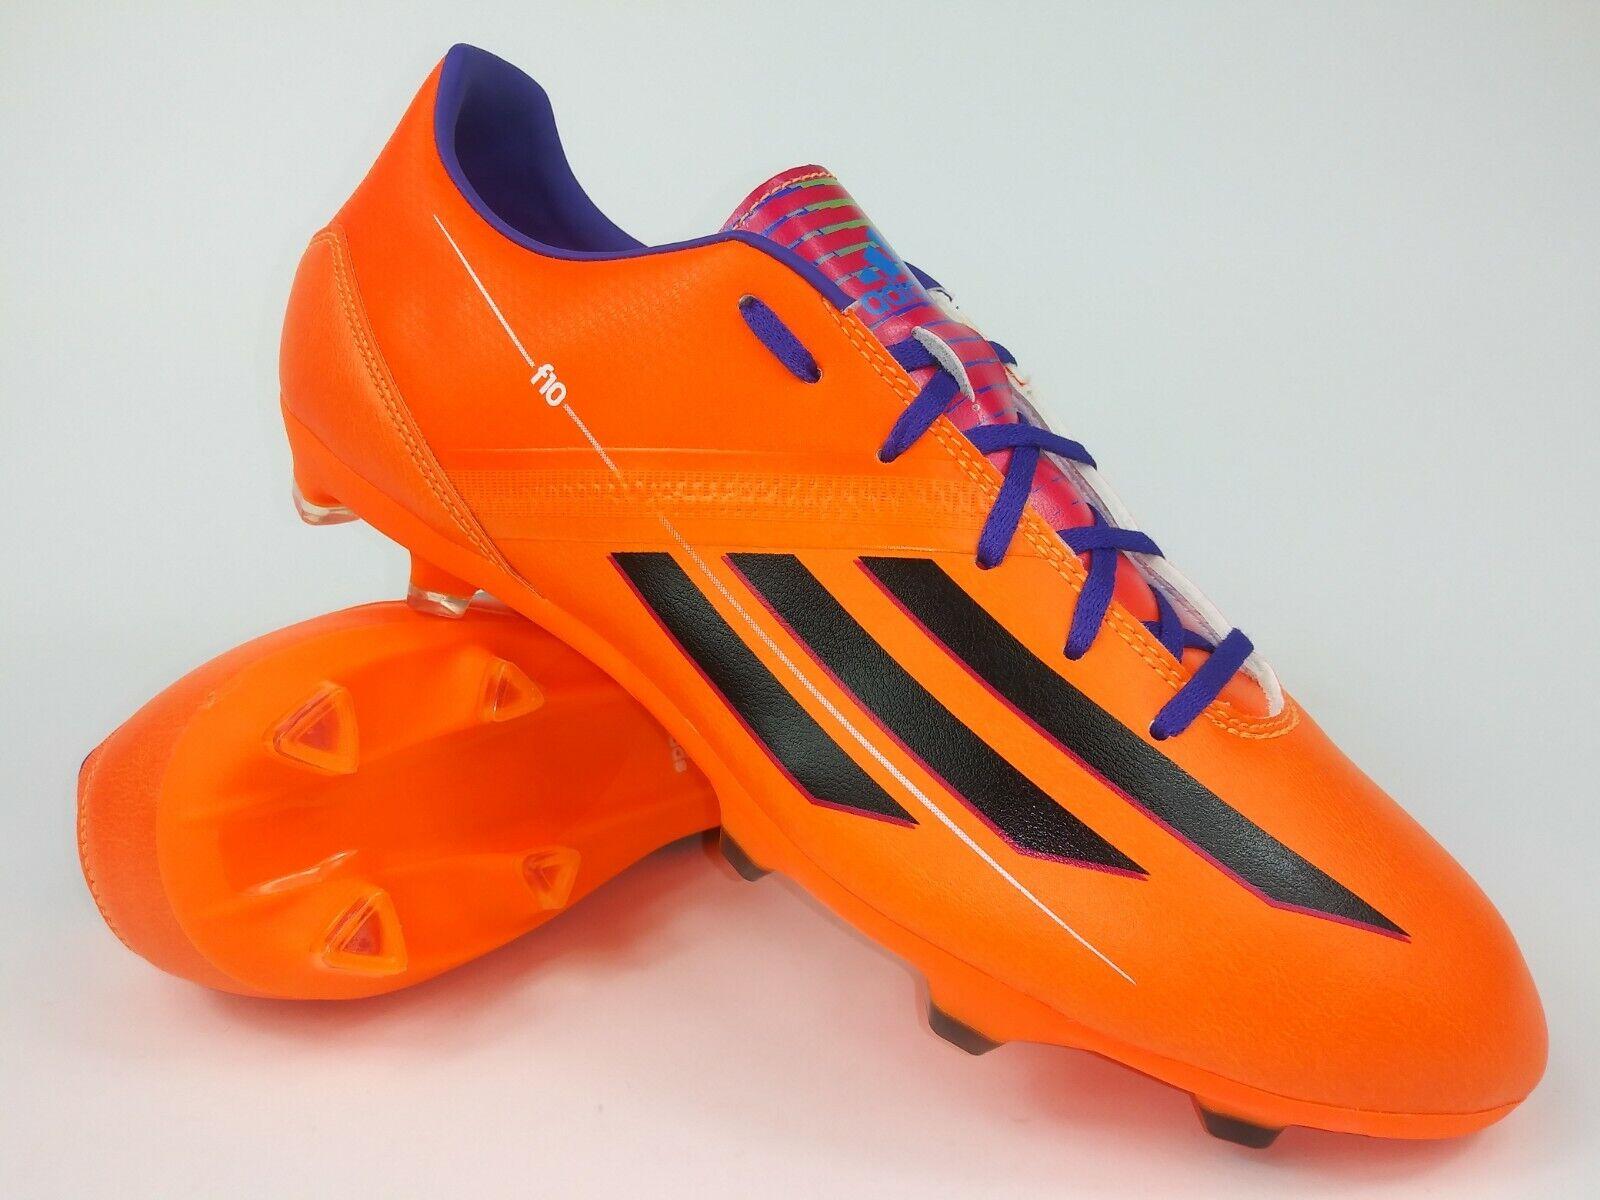 Adidas señores raramente f10 TRX FG f32693 naranja negros fútbol galerías